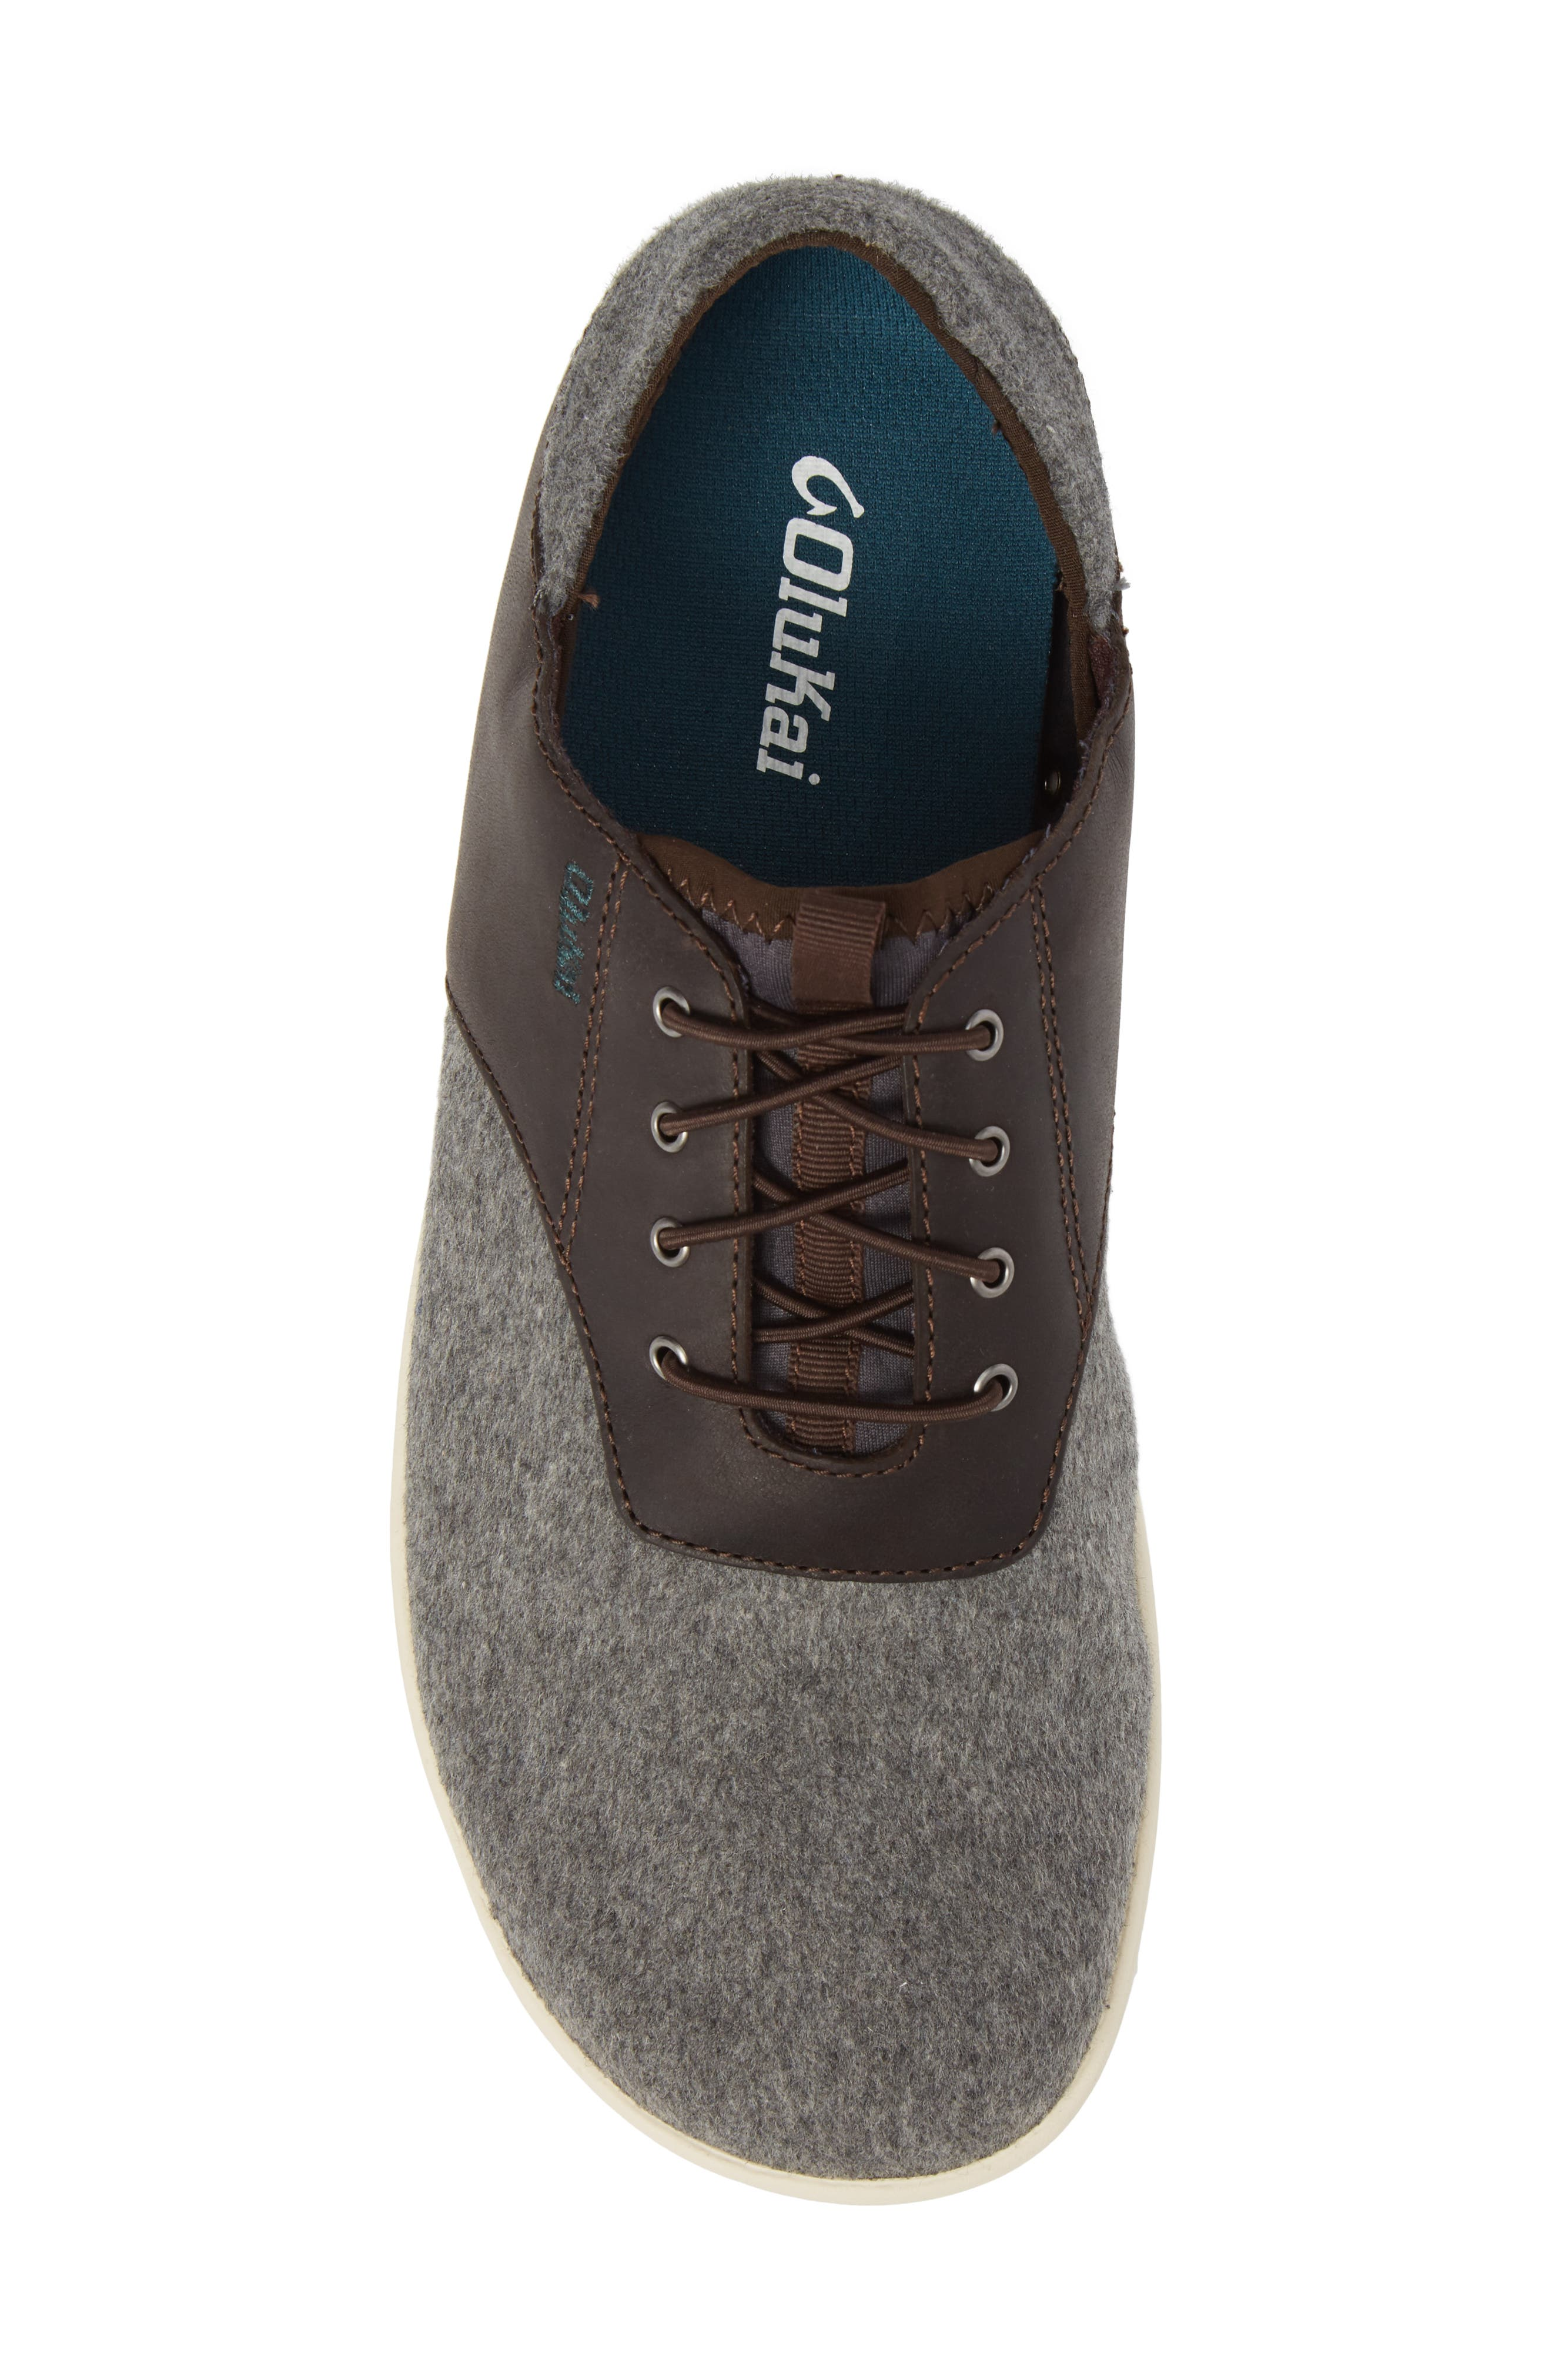 Nohea Moku Hulu Sneaker,                             Alternate thumbnail 5, color,                             Dark Roast/ Charcoal Wool